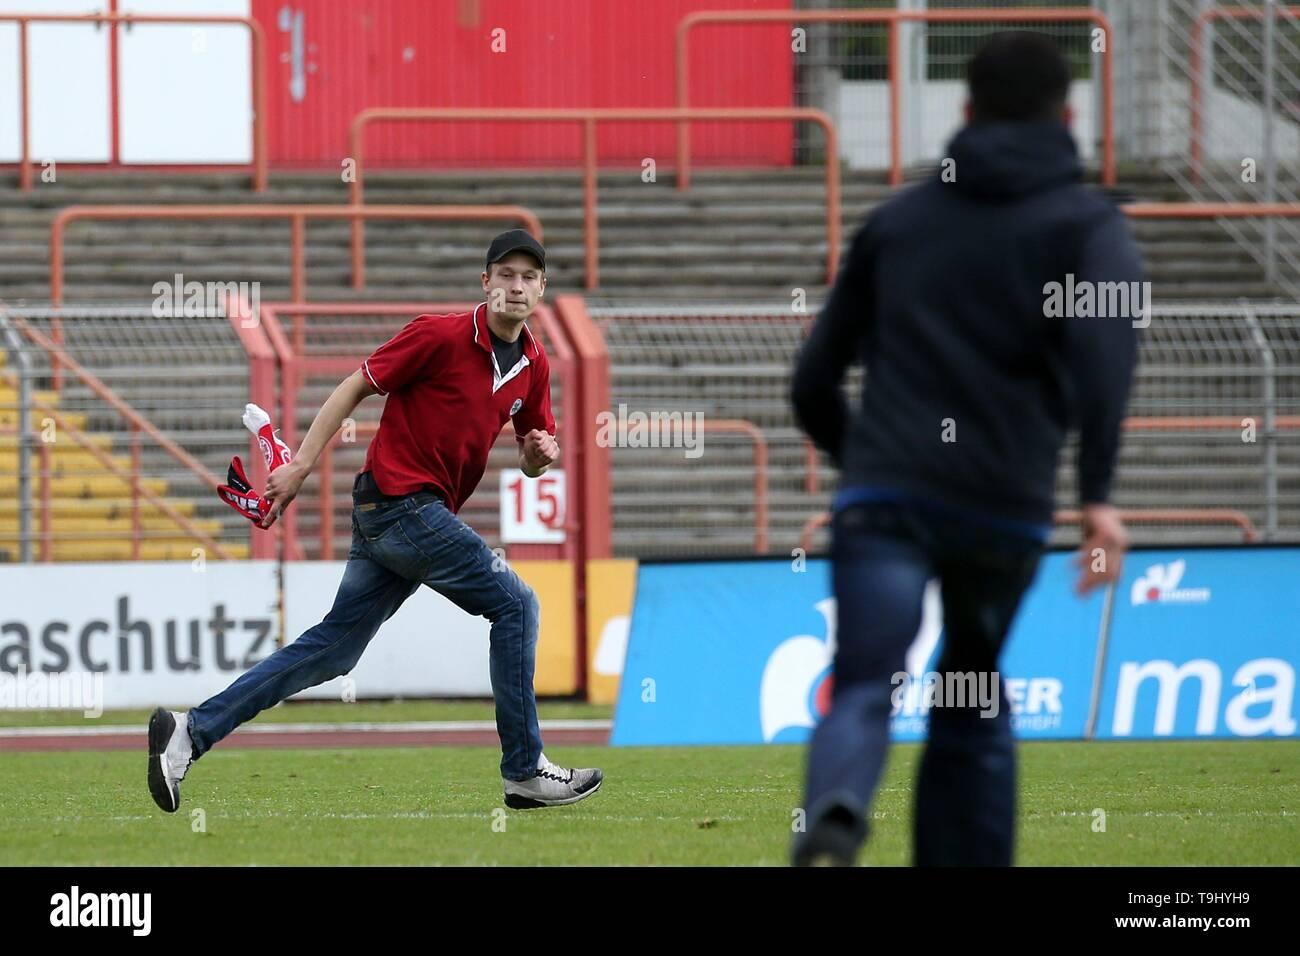 Oberhausen, Germany. 18th May, 2019. firo: 18.05.2019 Football, Regionalliga West, season 2018/2019 Rot-Weiss Oberhausen - SC Verl A runabout runs on the pitch. | usage worldwide Credit: dpa/Alamy Live News - Stock Image